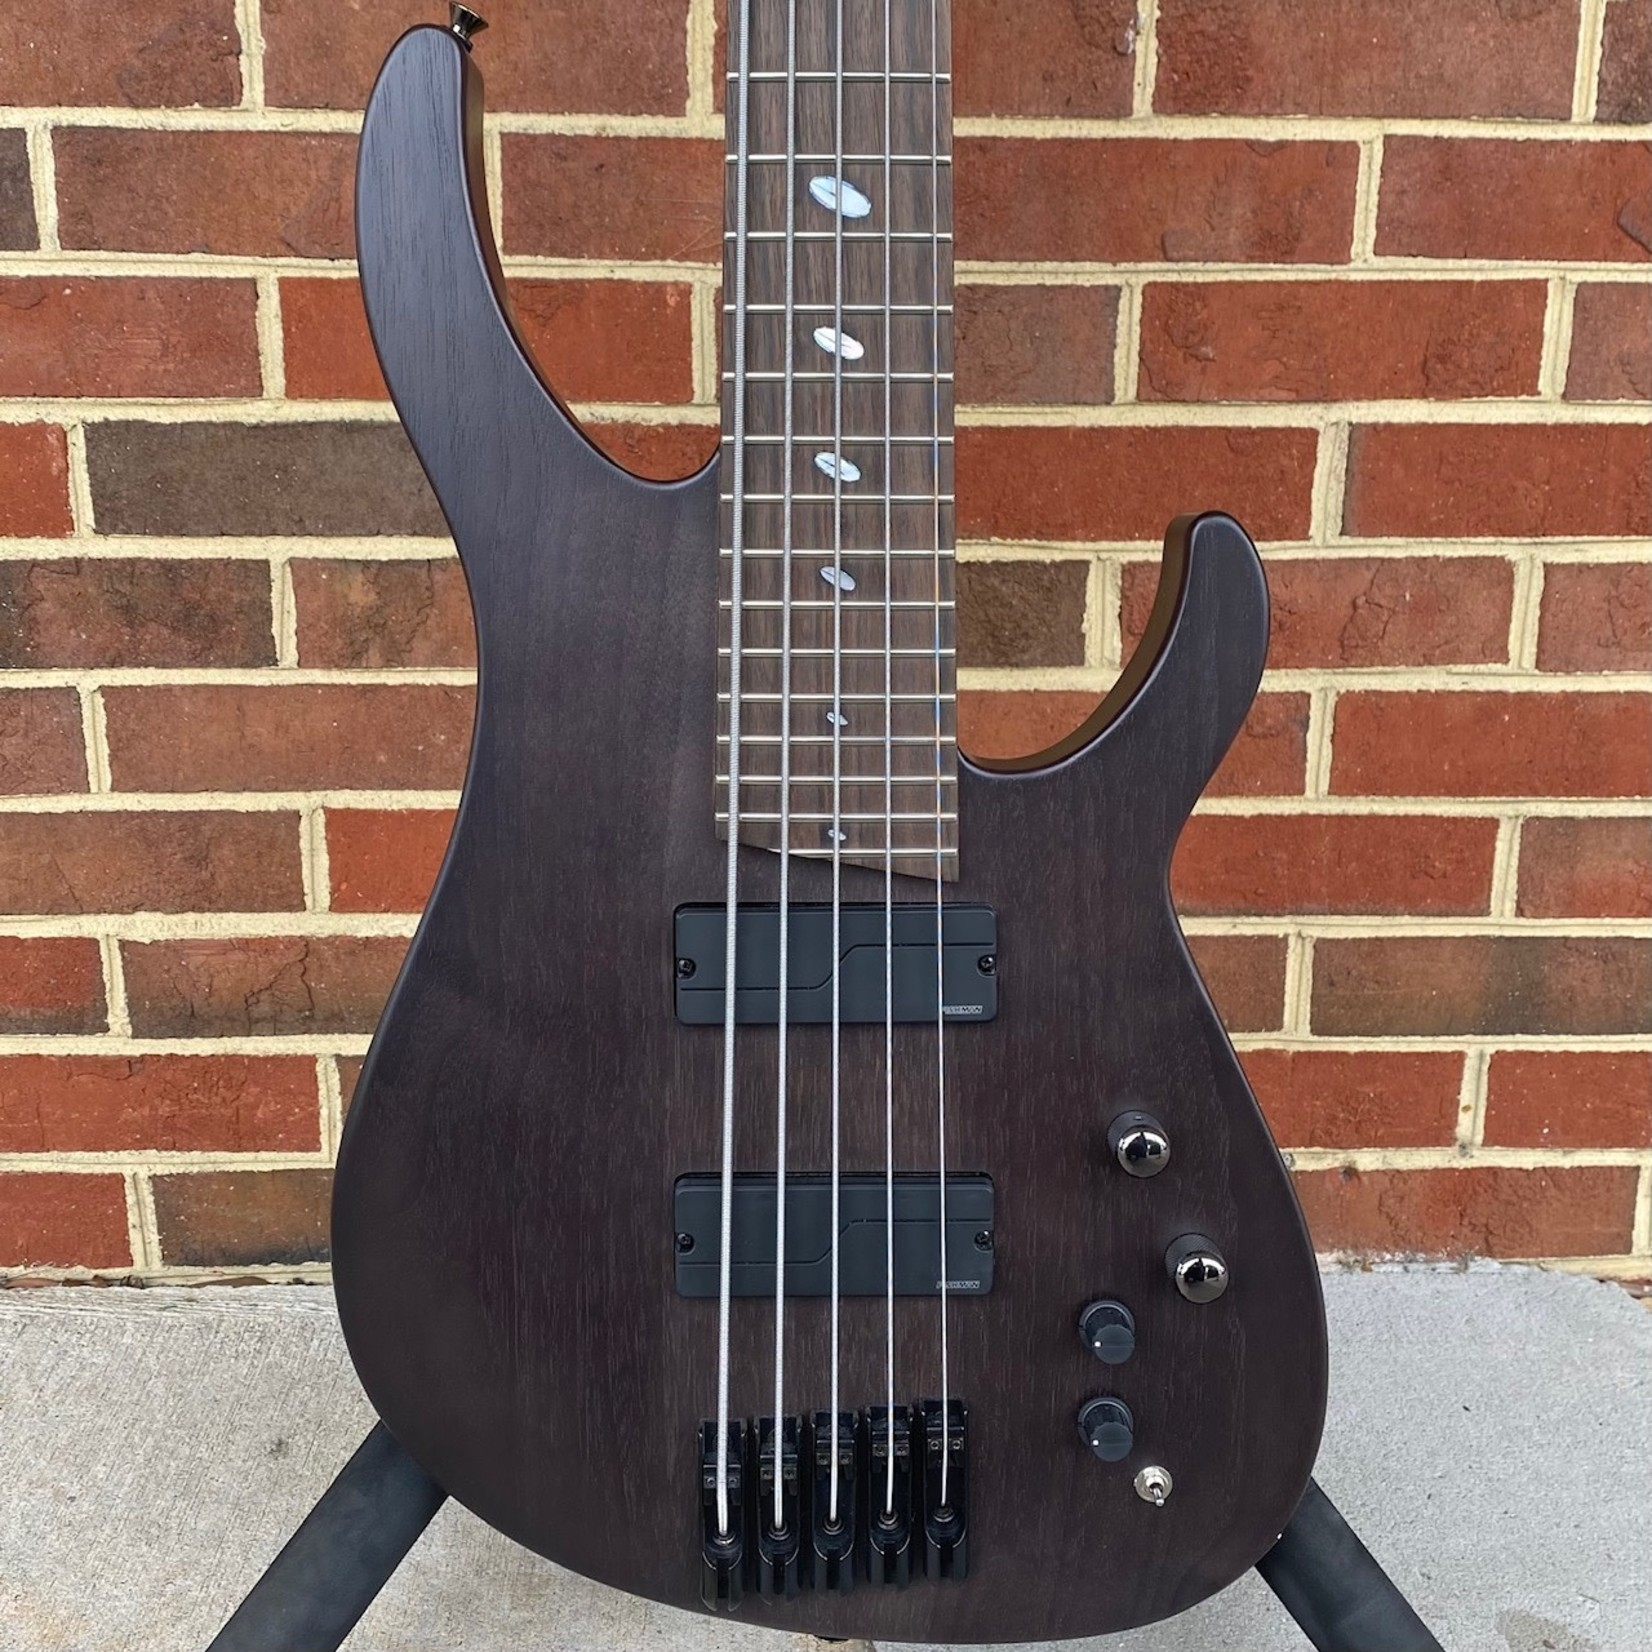 Caparison Guitars Caparison Brocken 5-BASS, Trans Black Matte